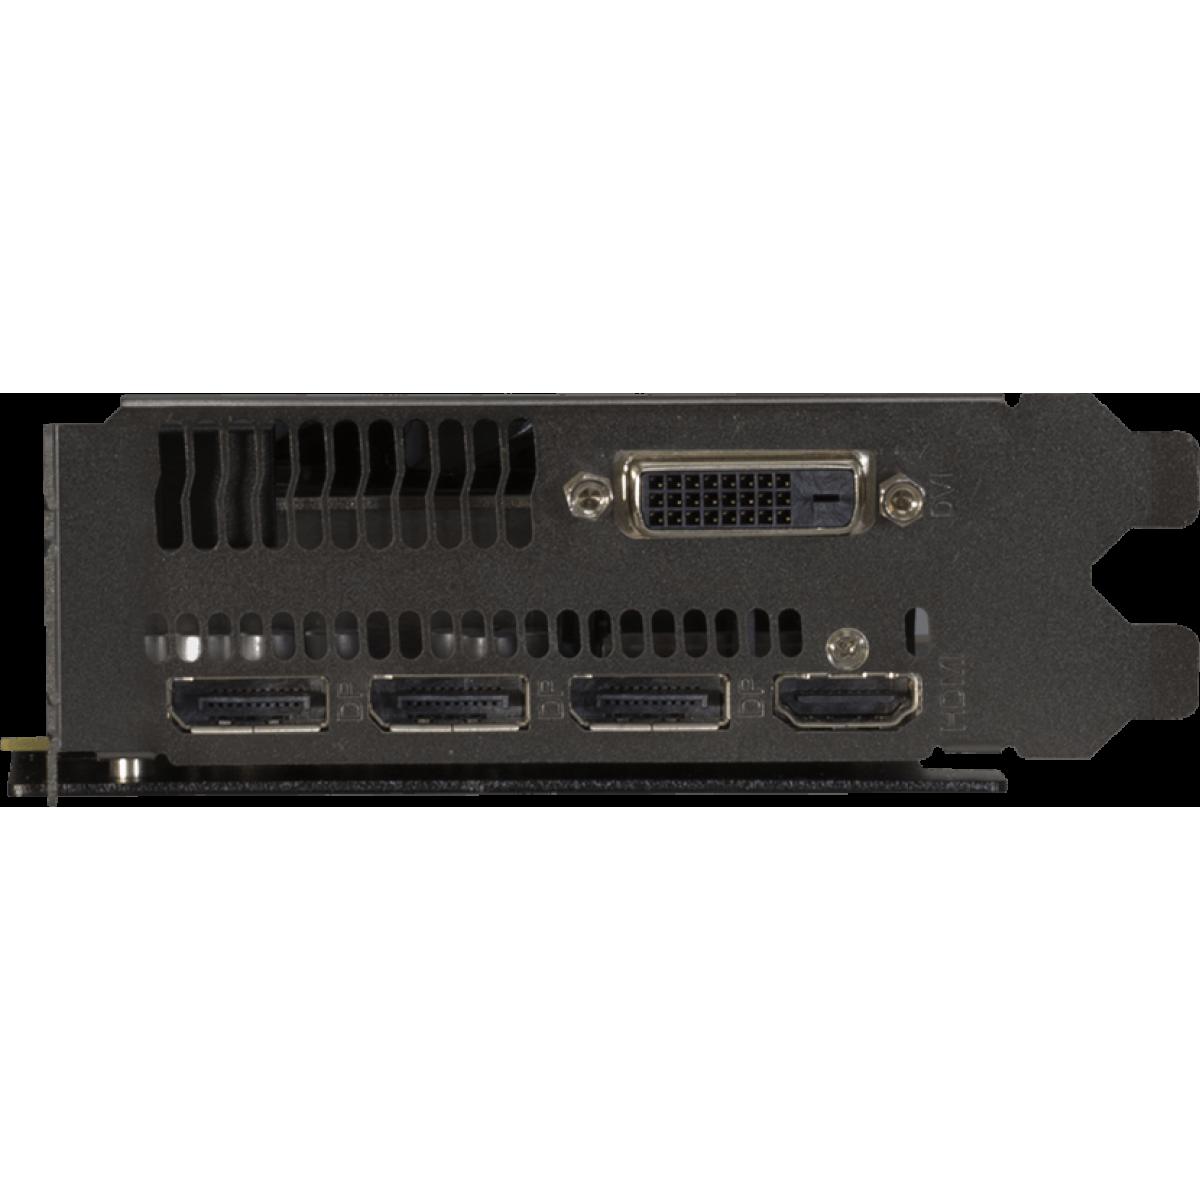 Placa de Vídeo PowerColor Radeon RX 570 Red Dragon Dual, 8GB GDDR5, 256Bit, AXRX570 8GBD5-3DHD/OC